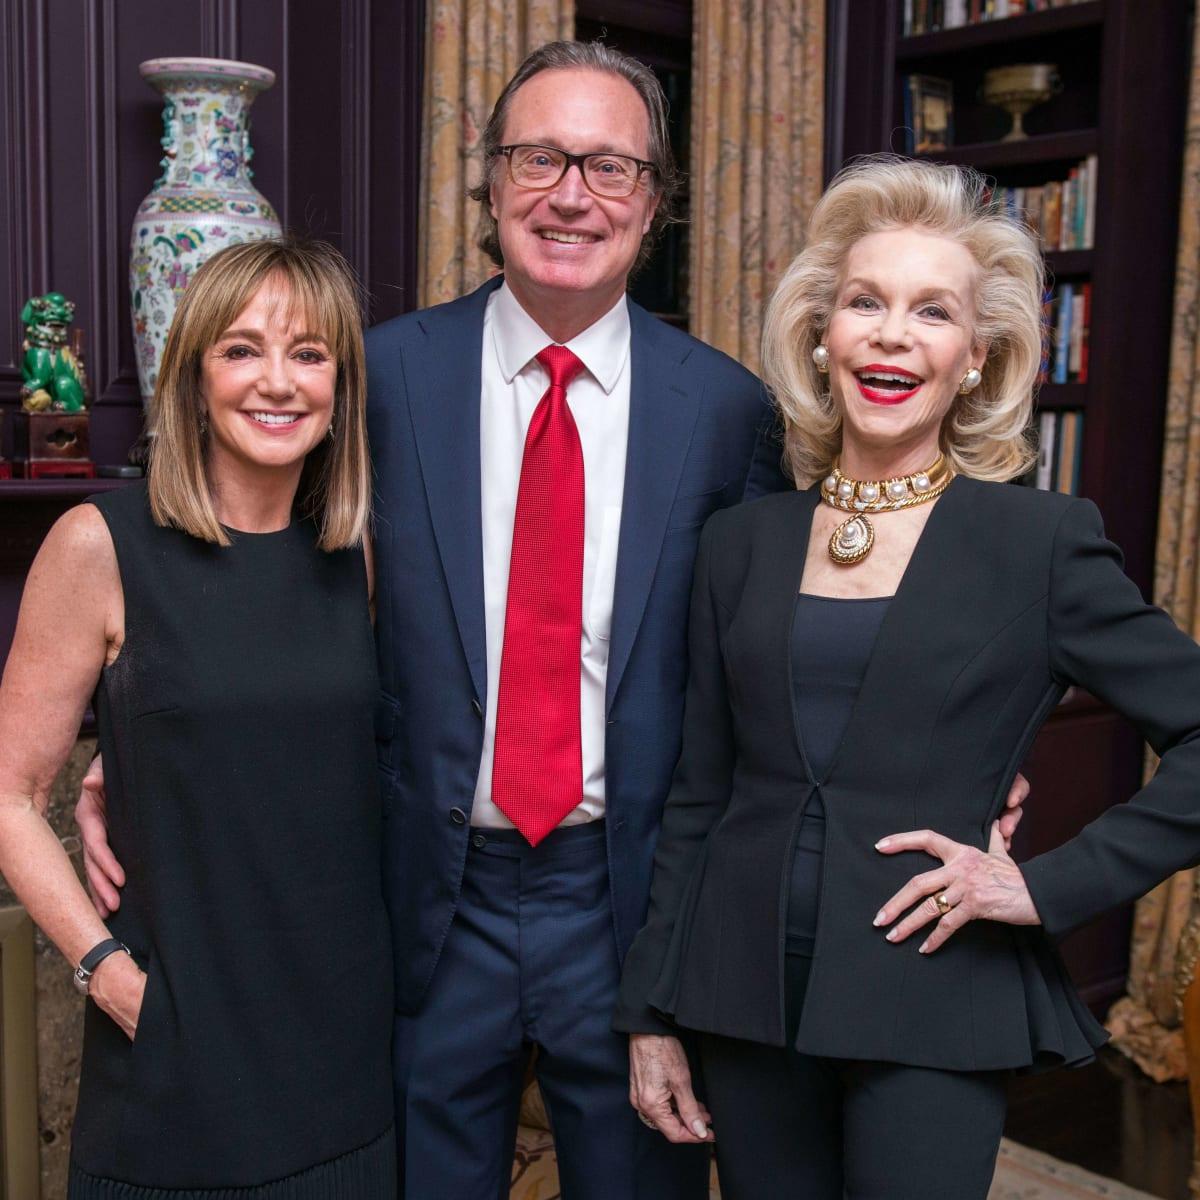 Janet Gurwitch, Ron Franklin, Lynn Wyatt at dinner for Brandon Maxwell